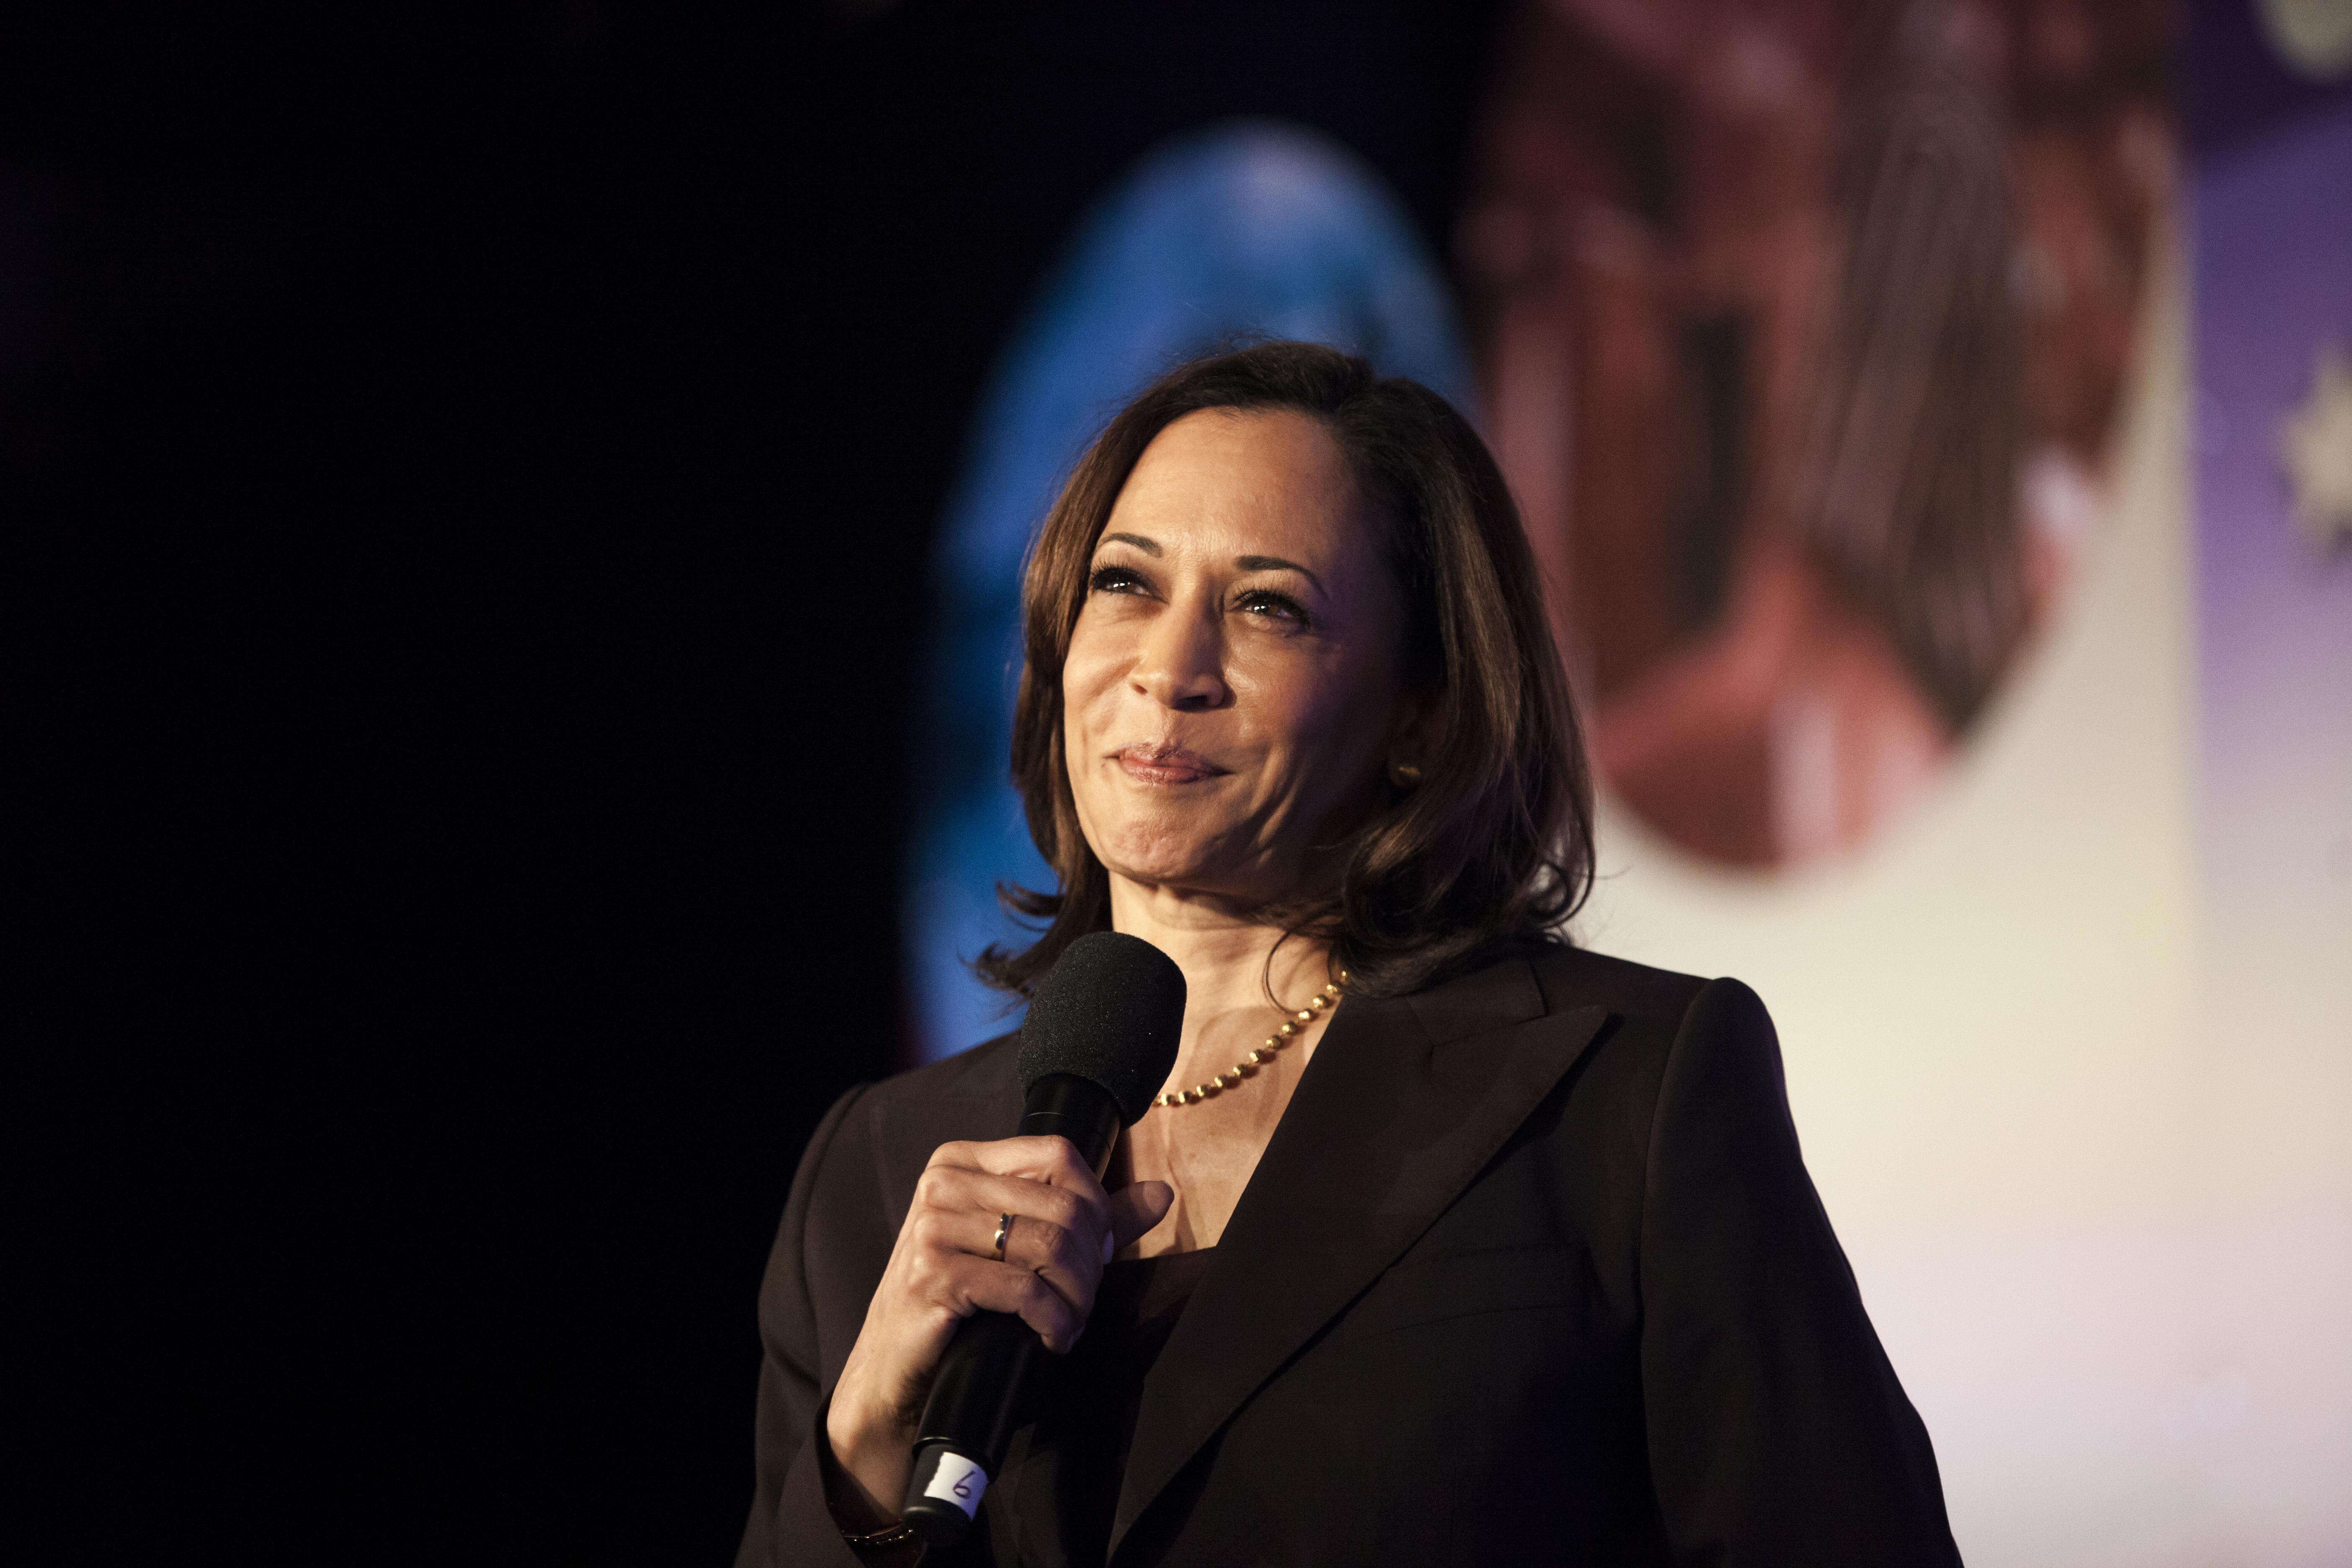 Kamala Harris Is Both A Historic And Flawed Candidate The Boston Globe